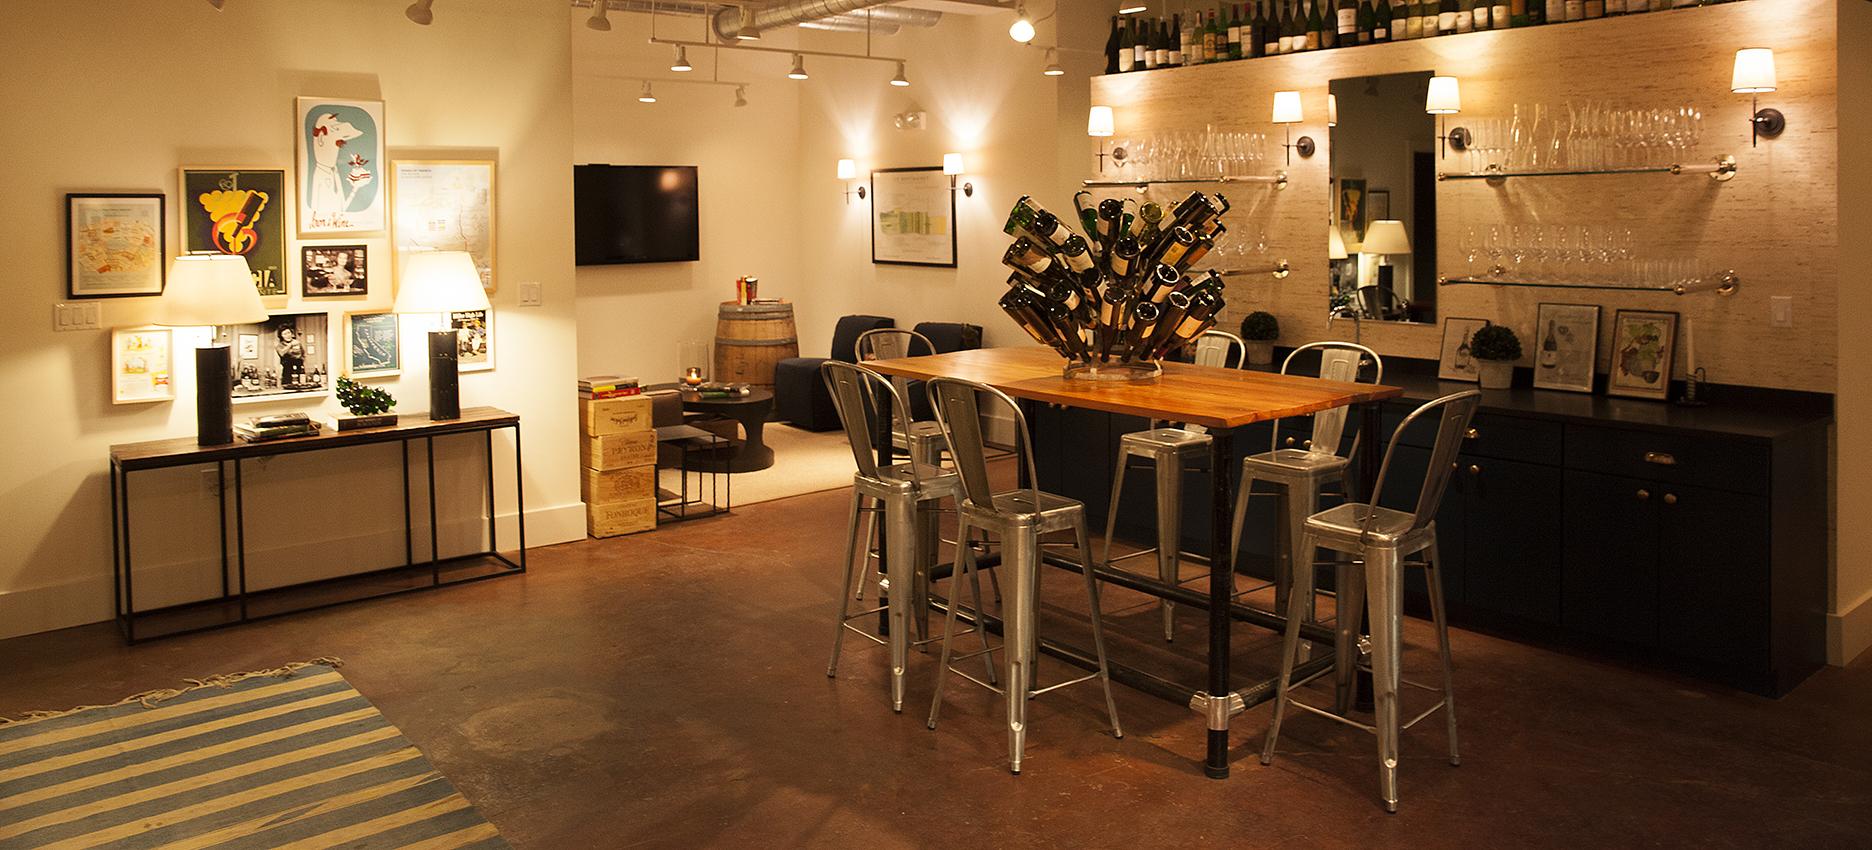 Domaine Wine Storage Reciation 4221 Connecticut Ave Nw Washington Dc 20008 Yp